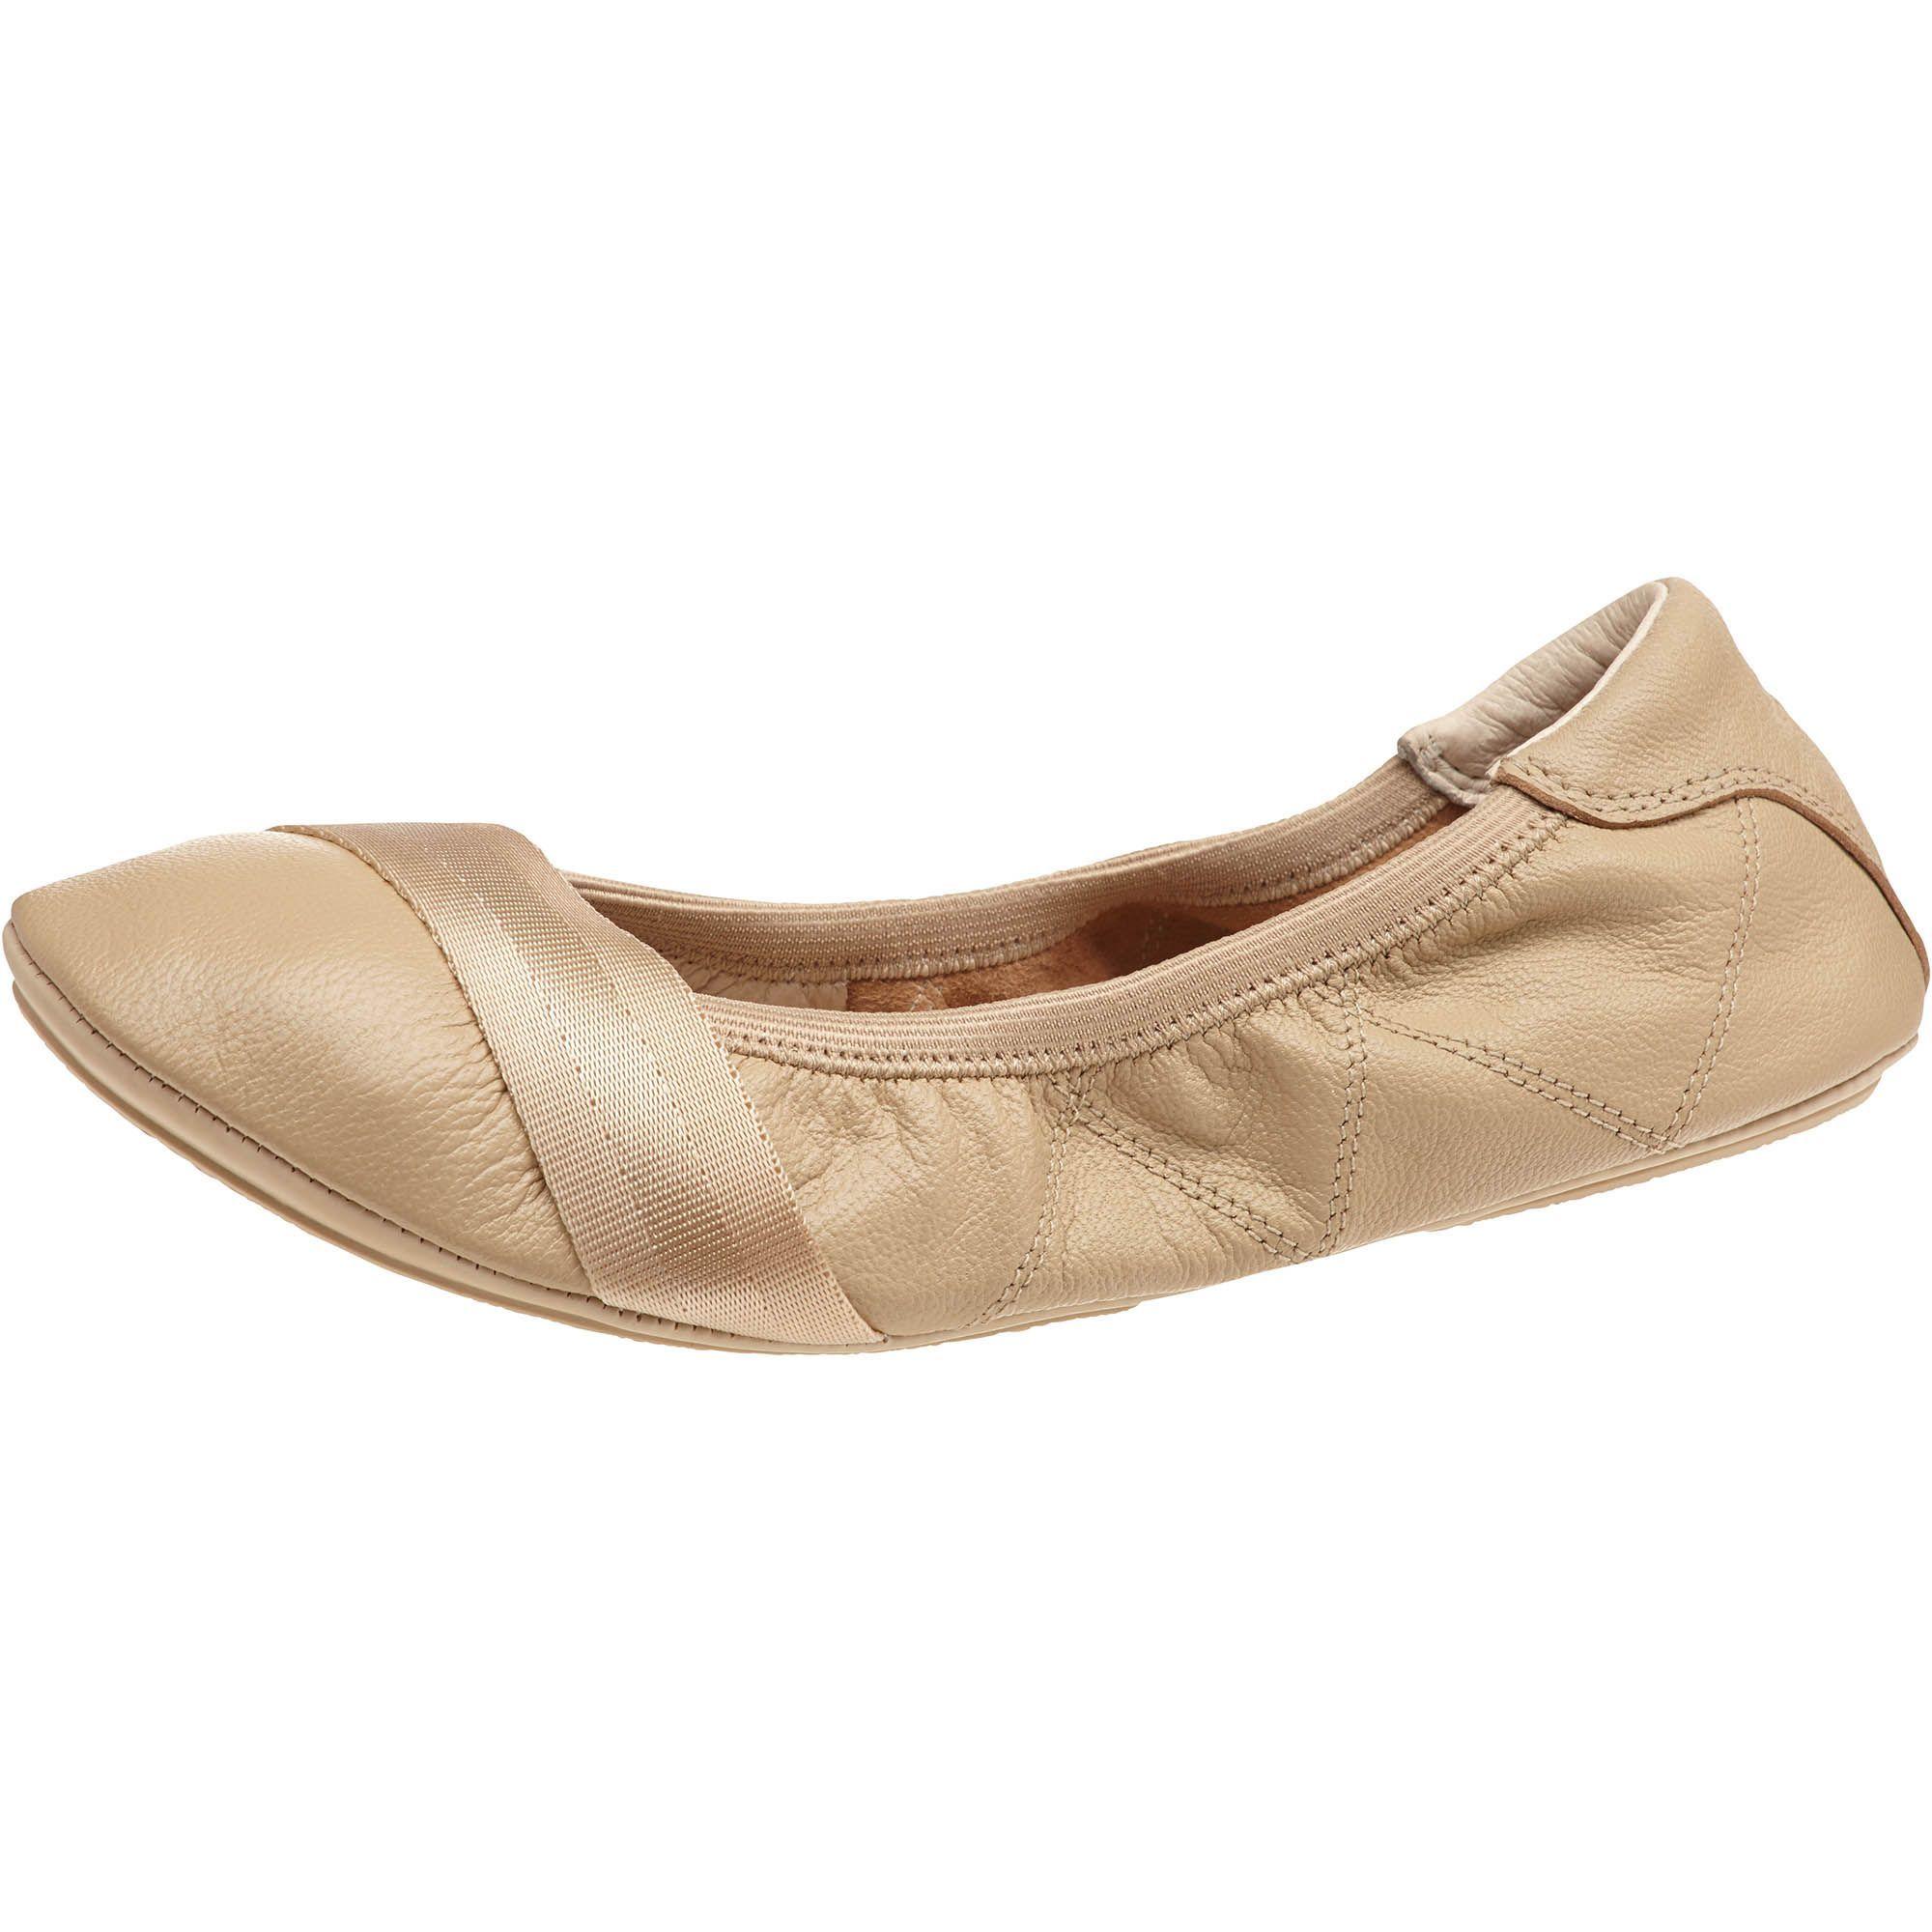 PUMA Rhythm Women's Ballet Flats